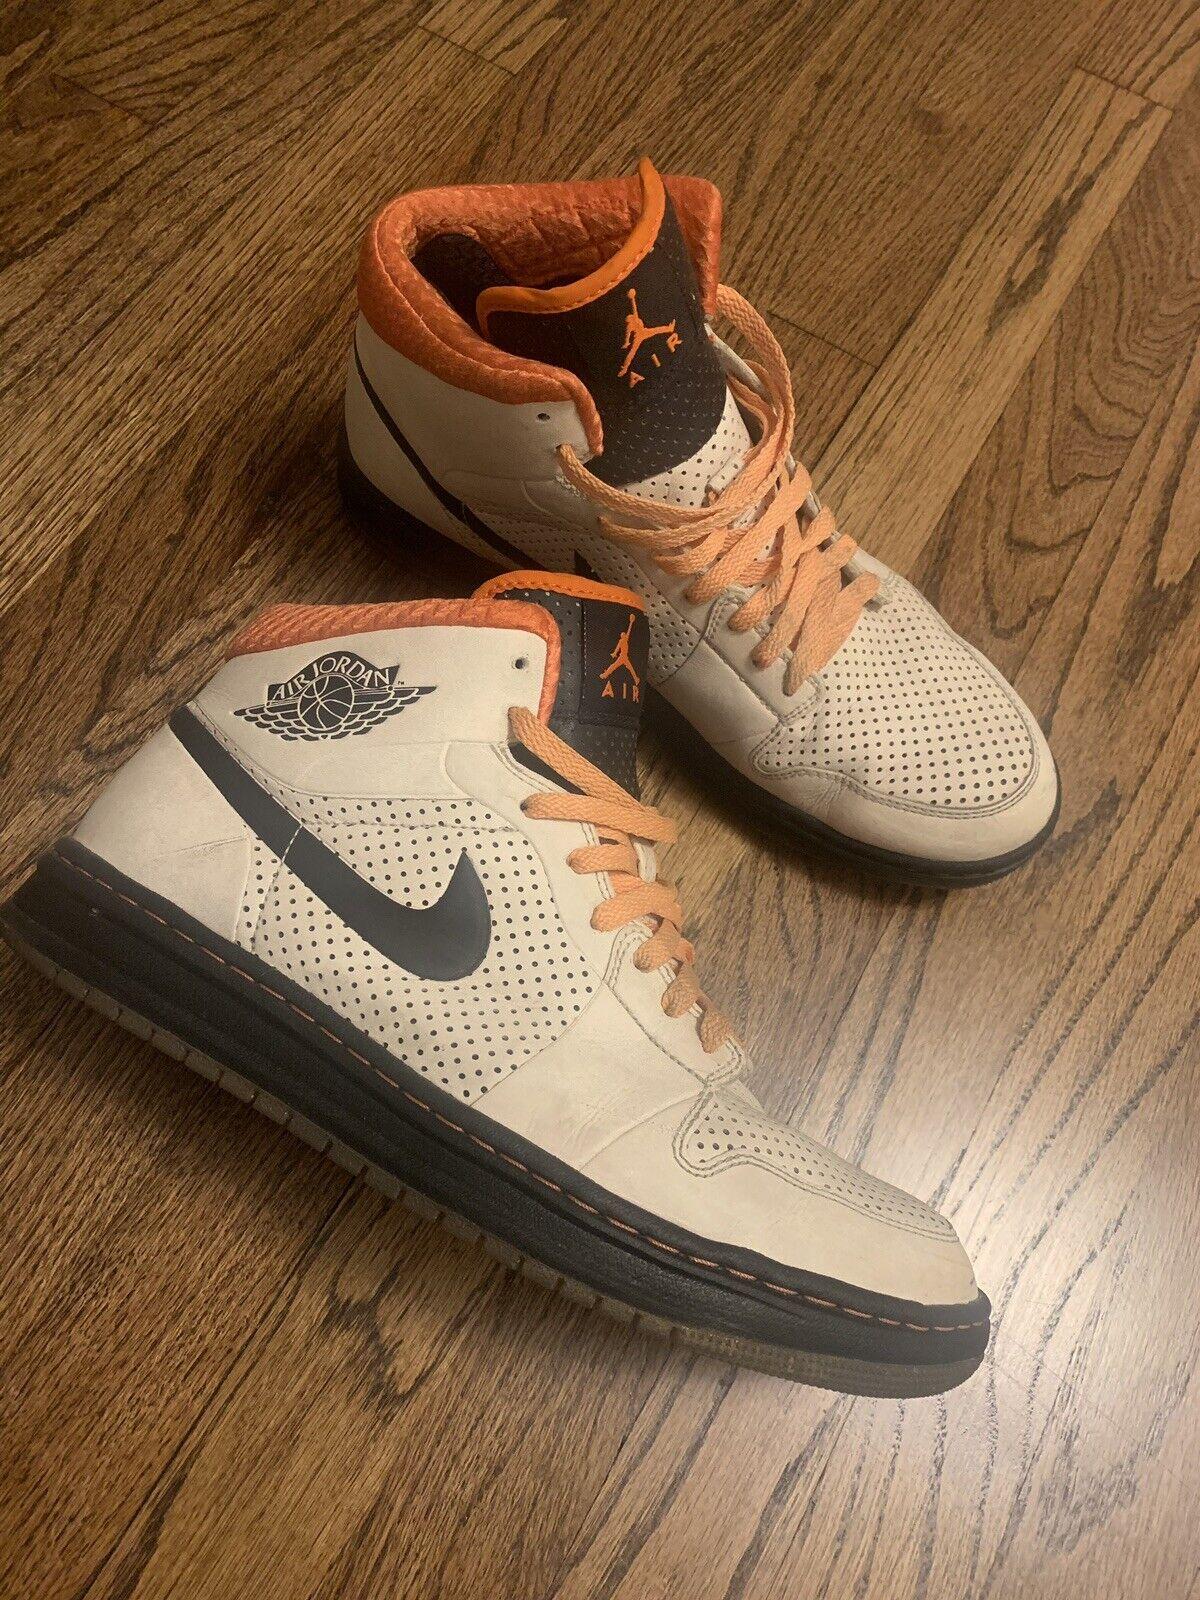 Mens Nike Air Jordan Alpha 1 Retro Birch off white orange black Size 11